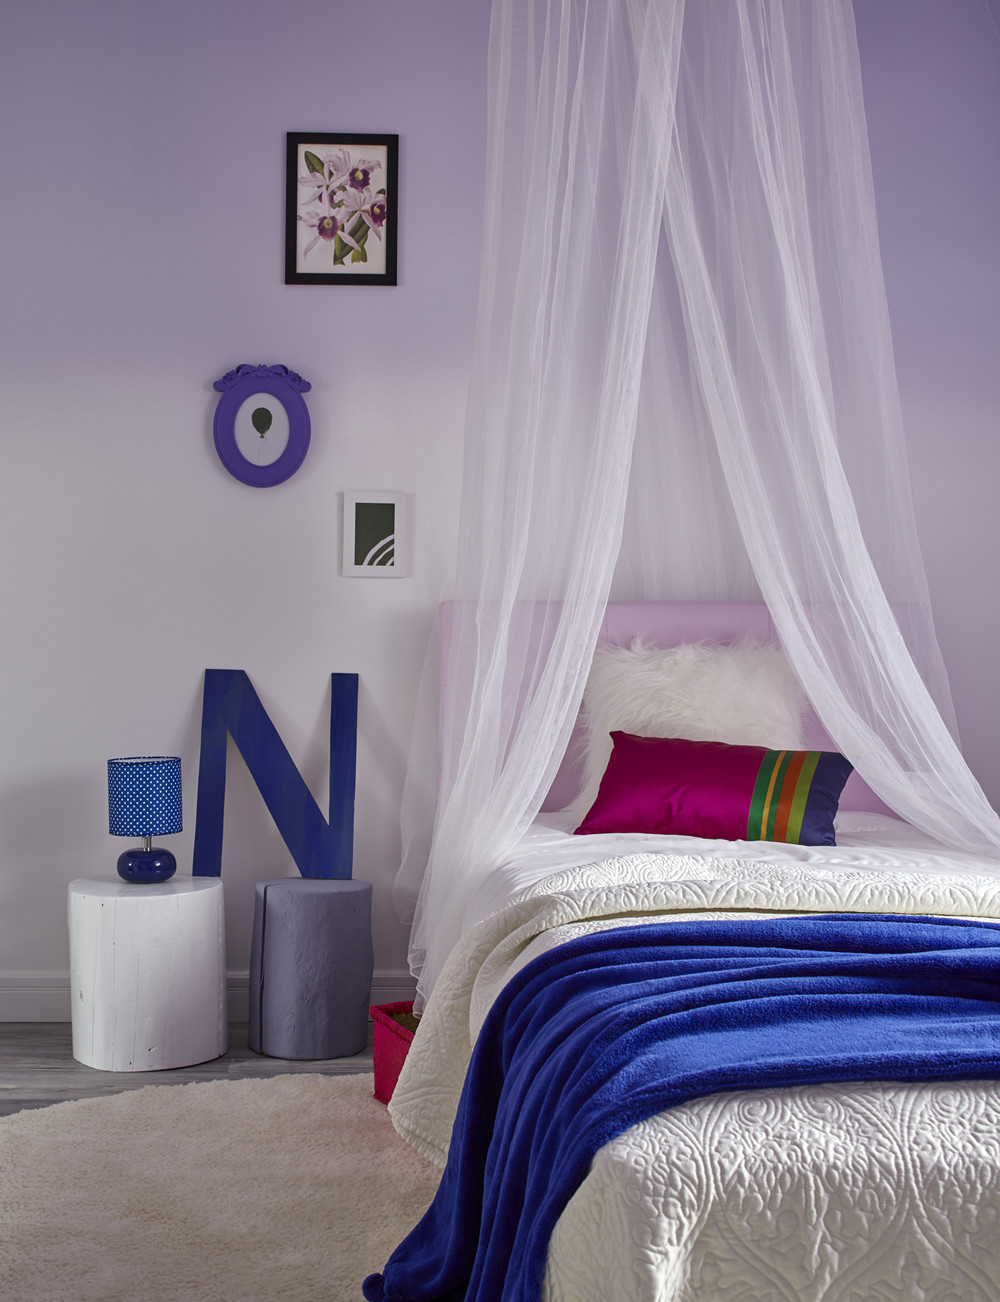 Квартира «Квартира с шевроном», спальня, фото из проекта